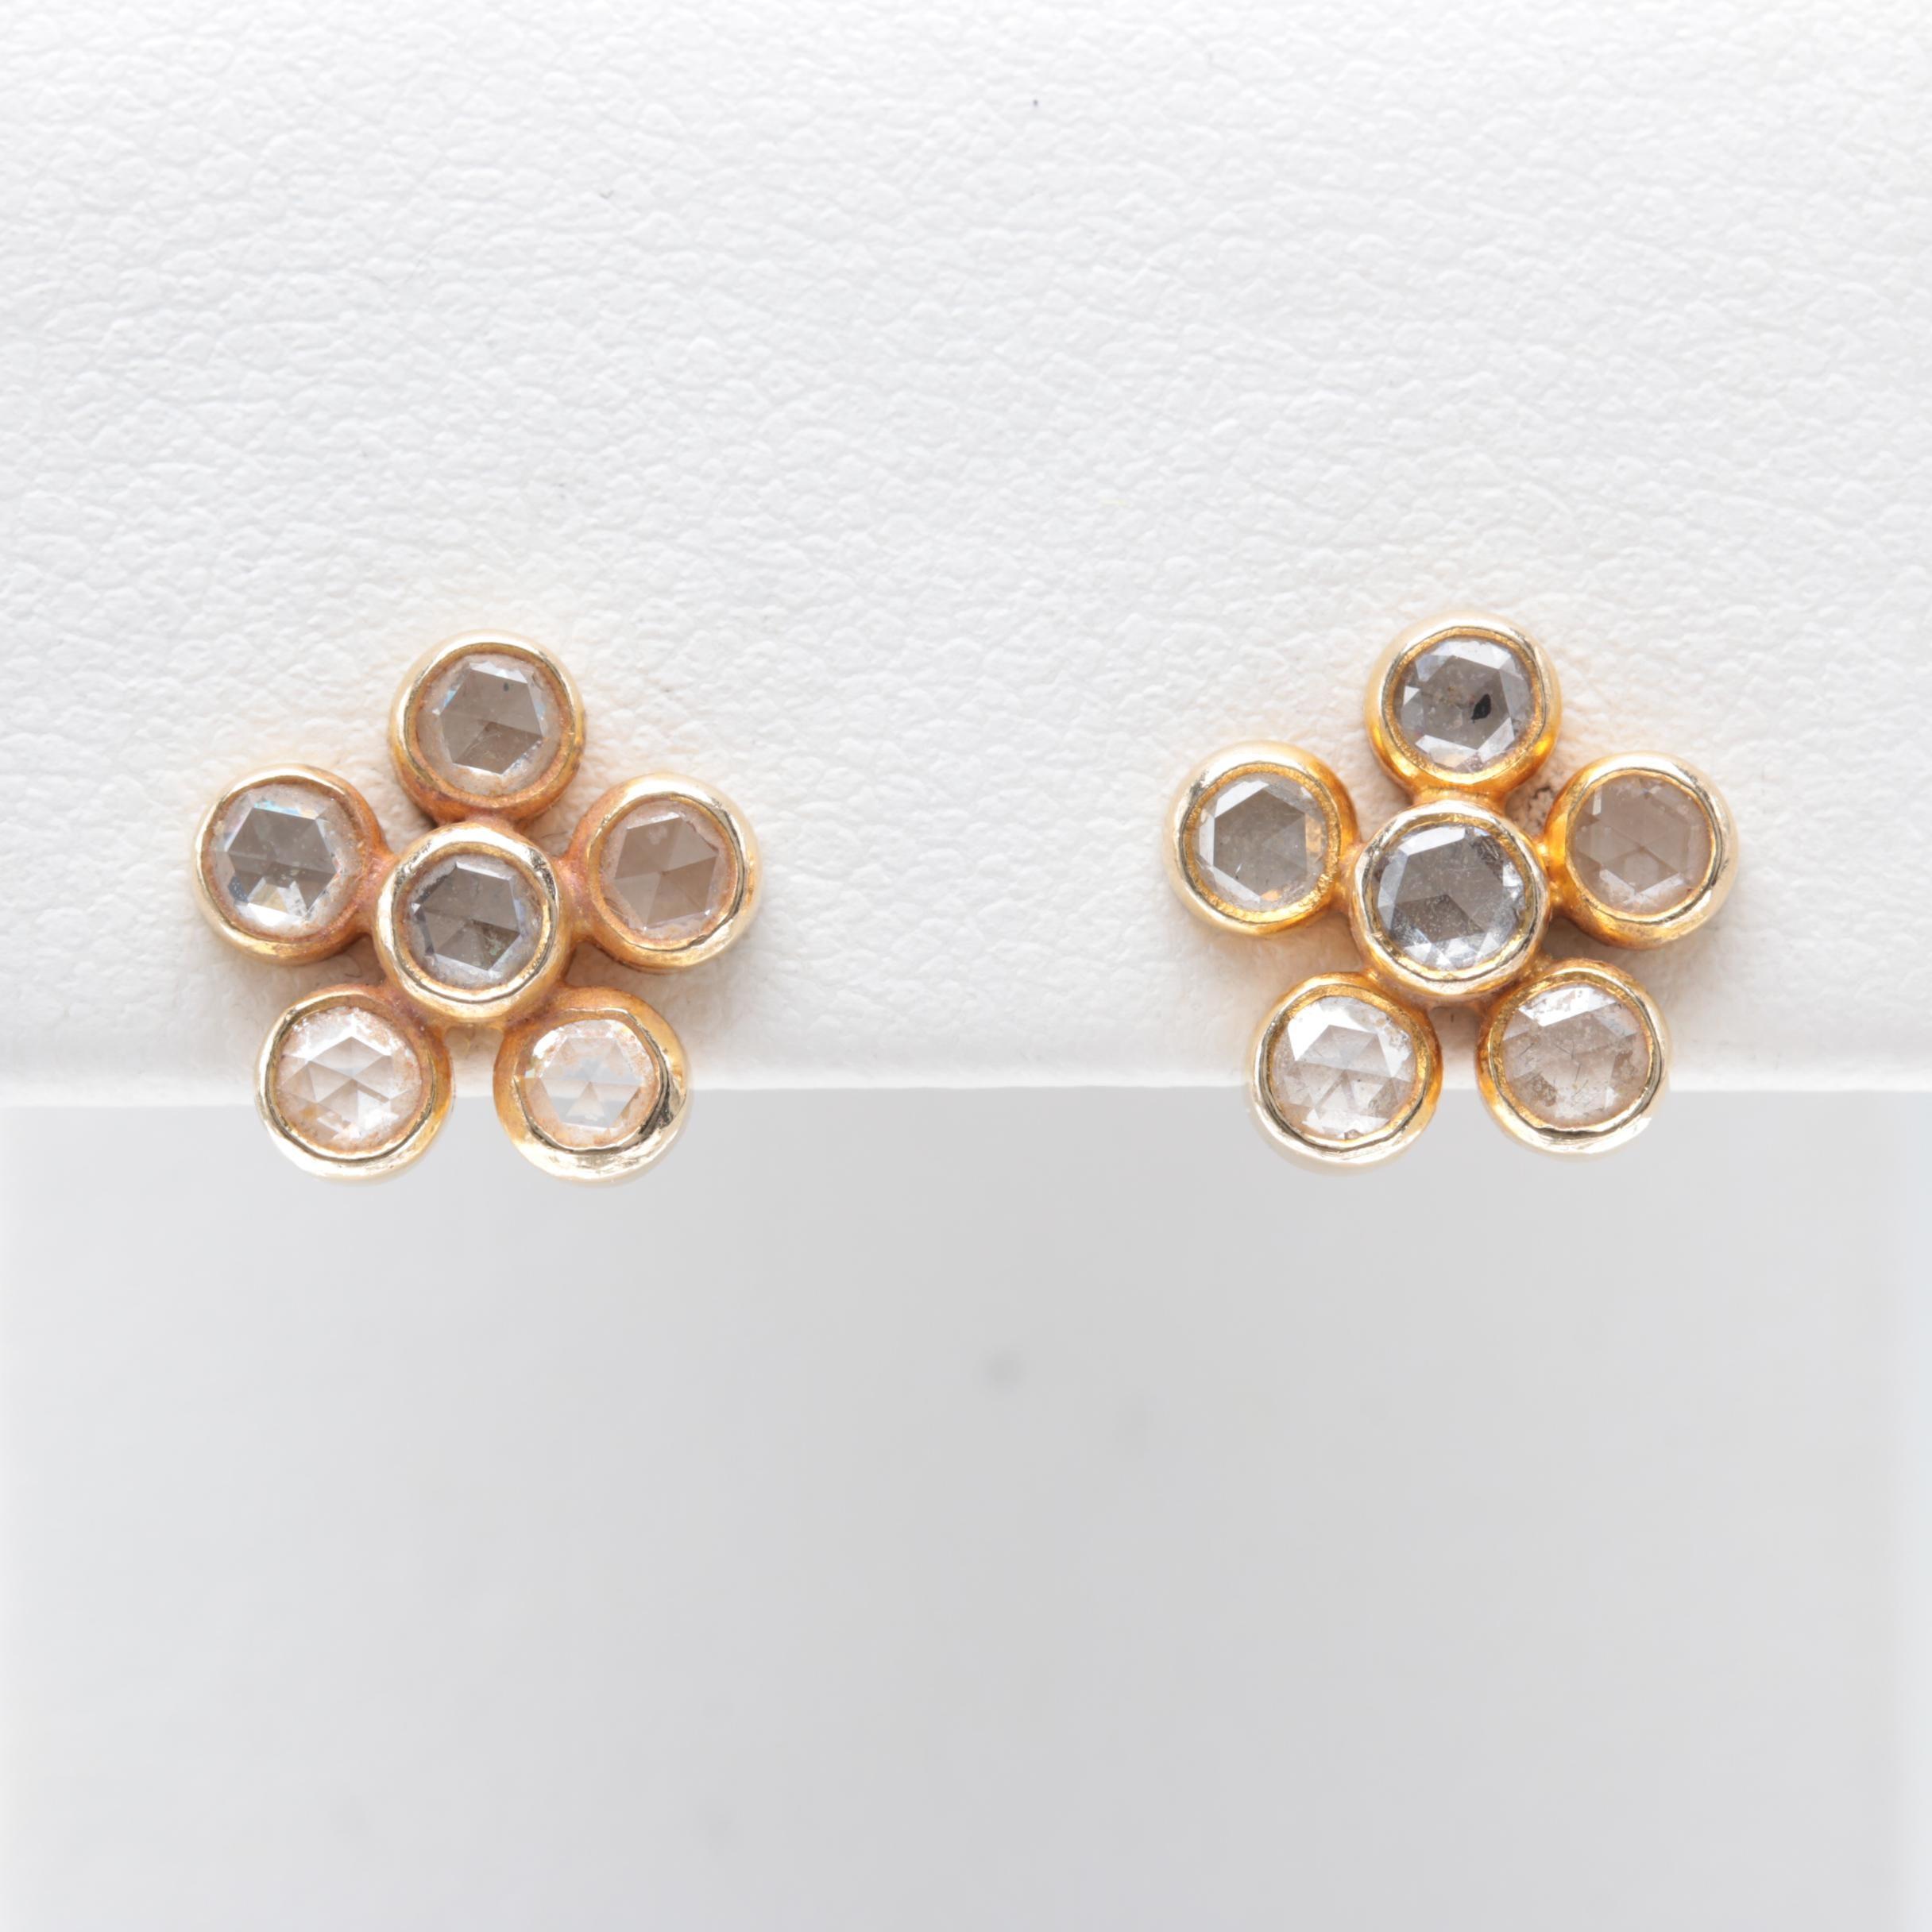 14K Yellow Gold Diamond Flower Earrings